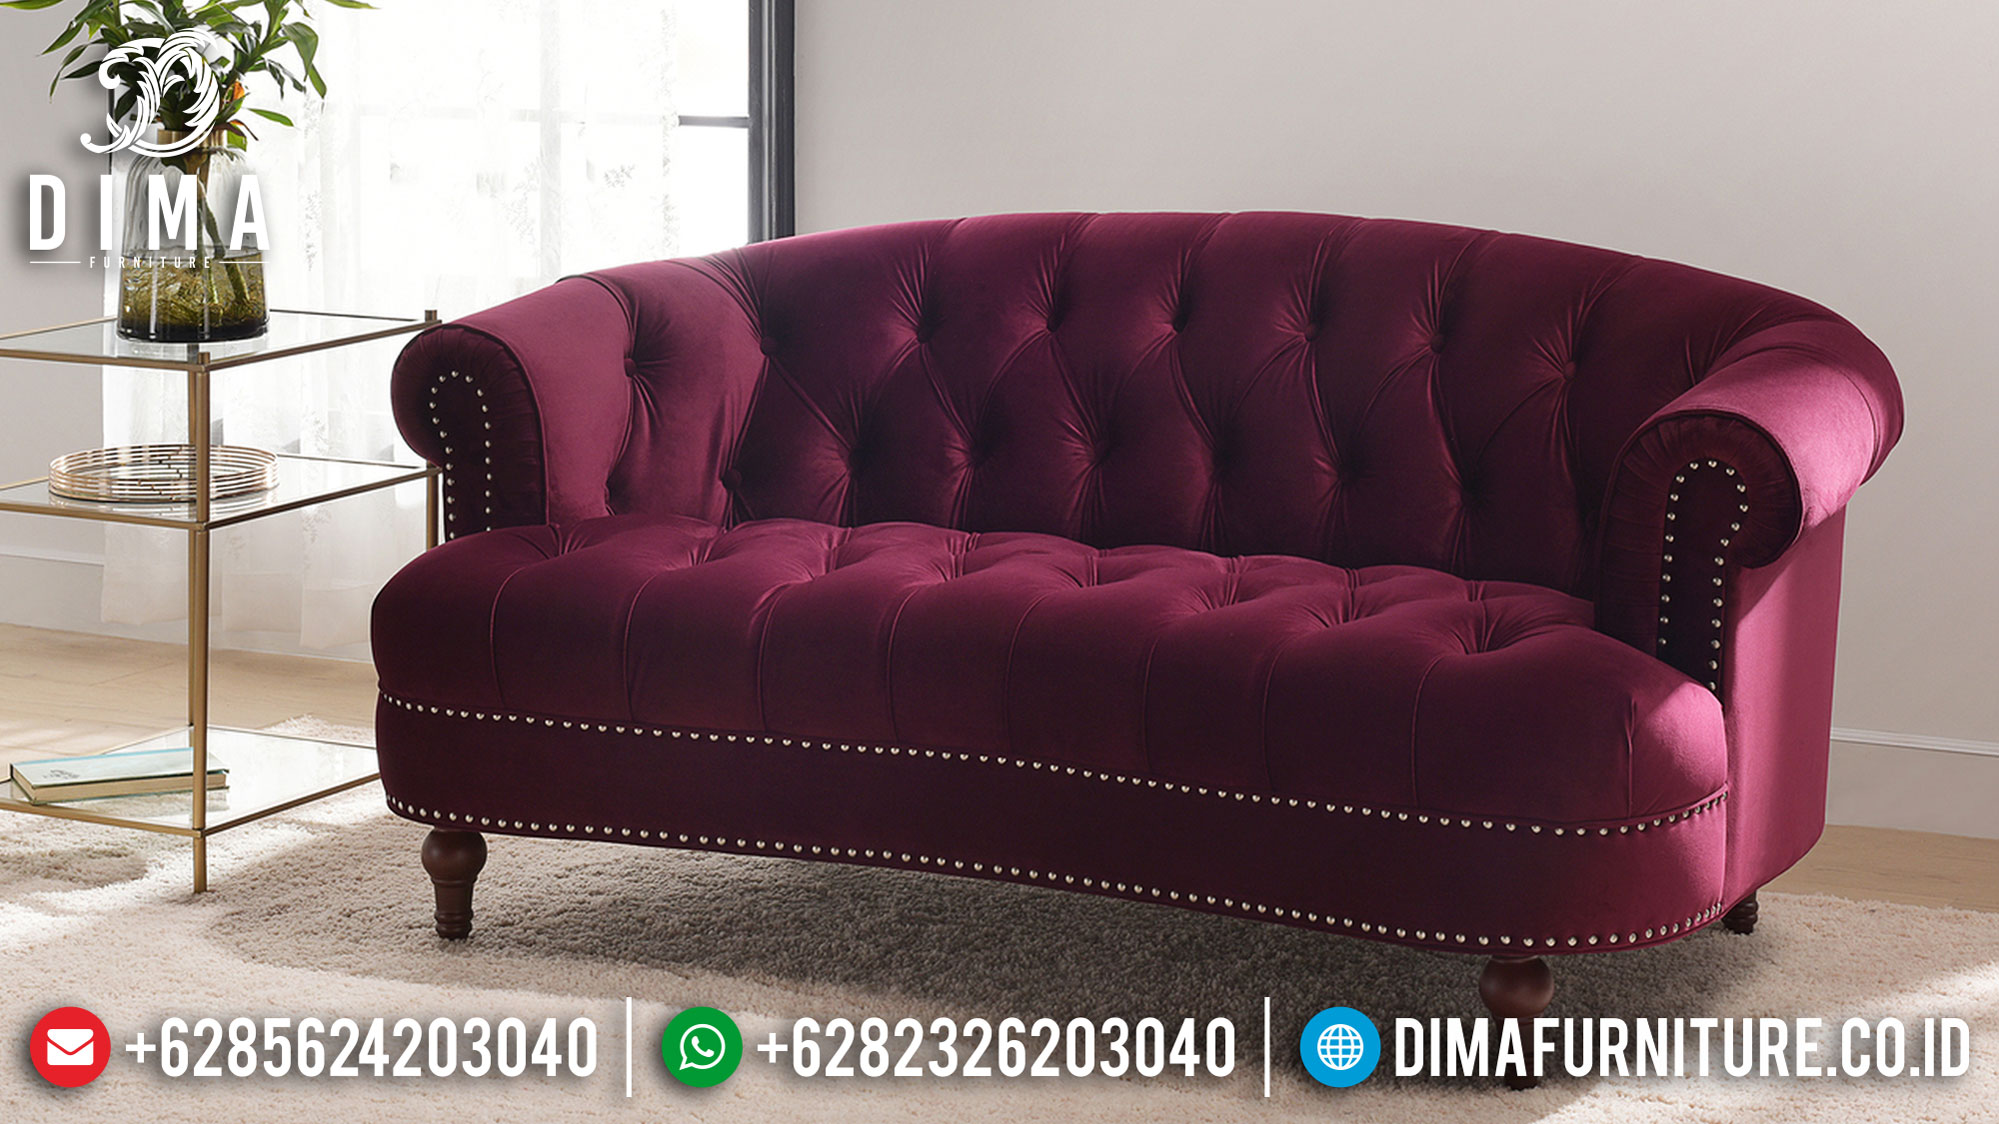 Sofa Minimalis Modern 3 Dudukan Desain Futuristic Beauty Living Room Style TTJ-1060